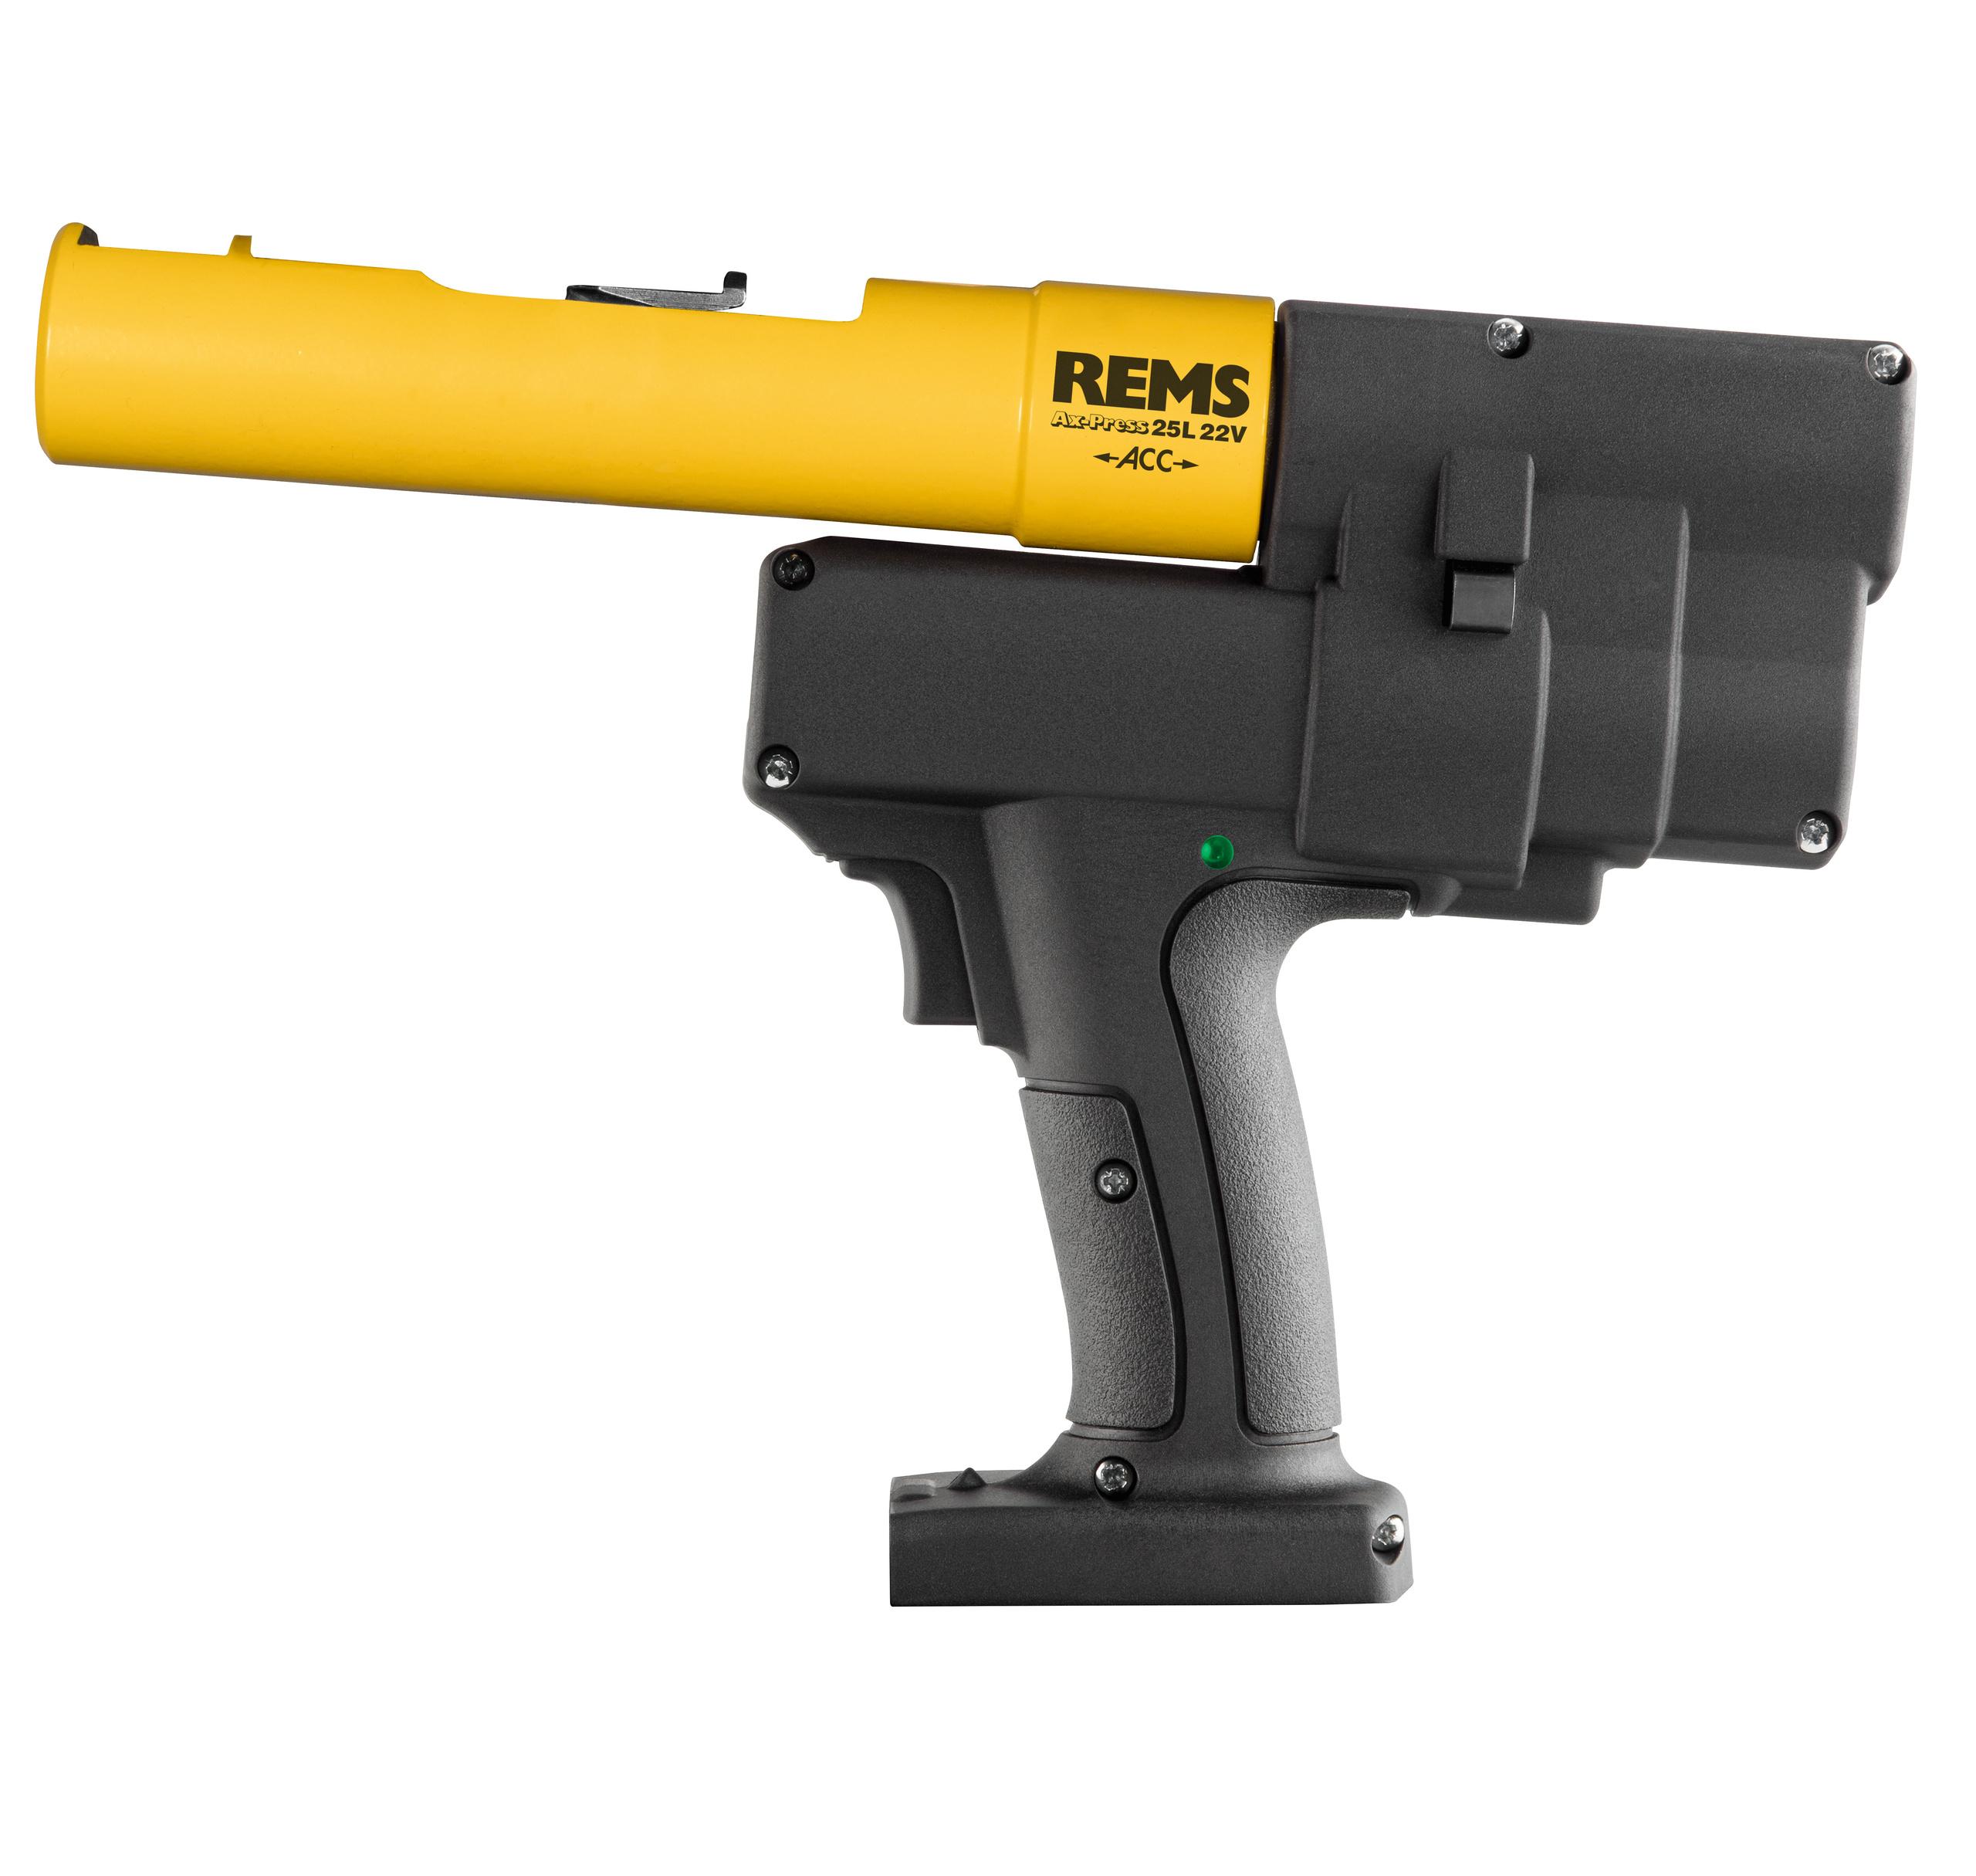 <br/>REMS Ax-Press 25 L 22V ACC